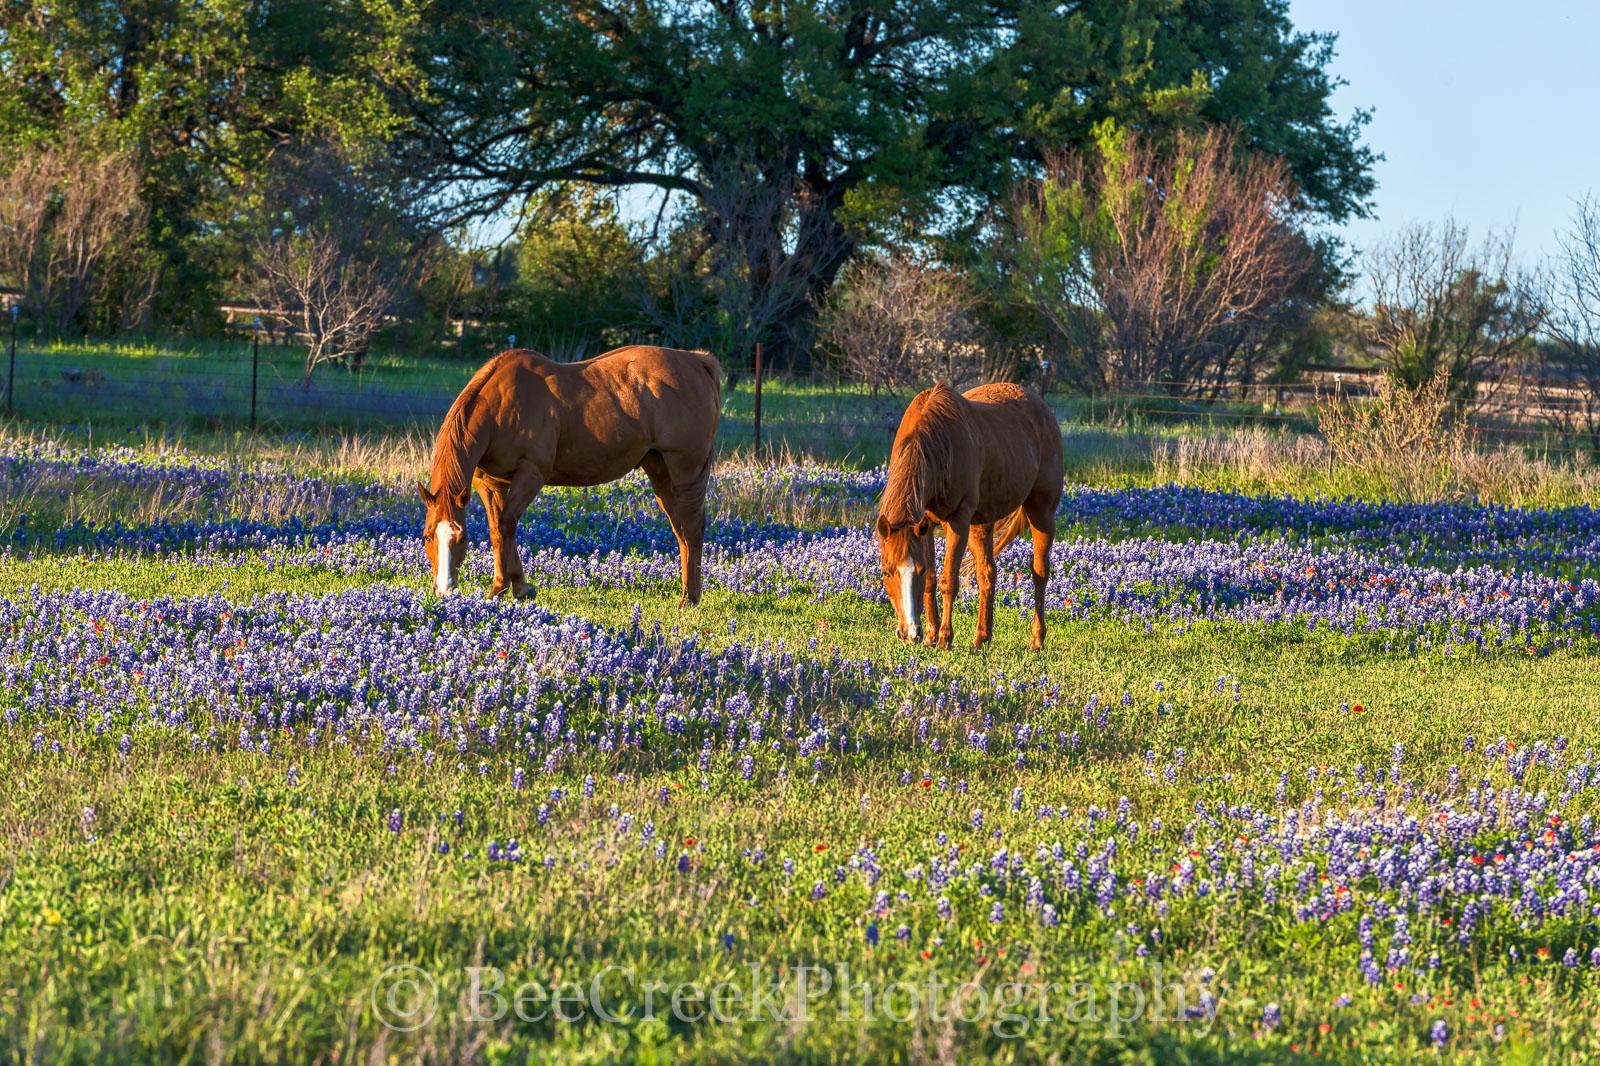 bluebonnets, wildflowers, field, flowers, horses, field, flowes, landscape, pasture, rural, , photo